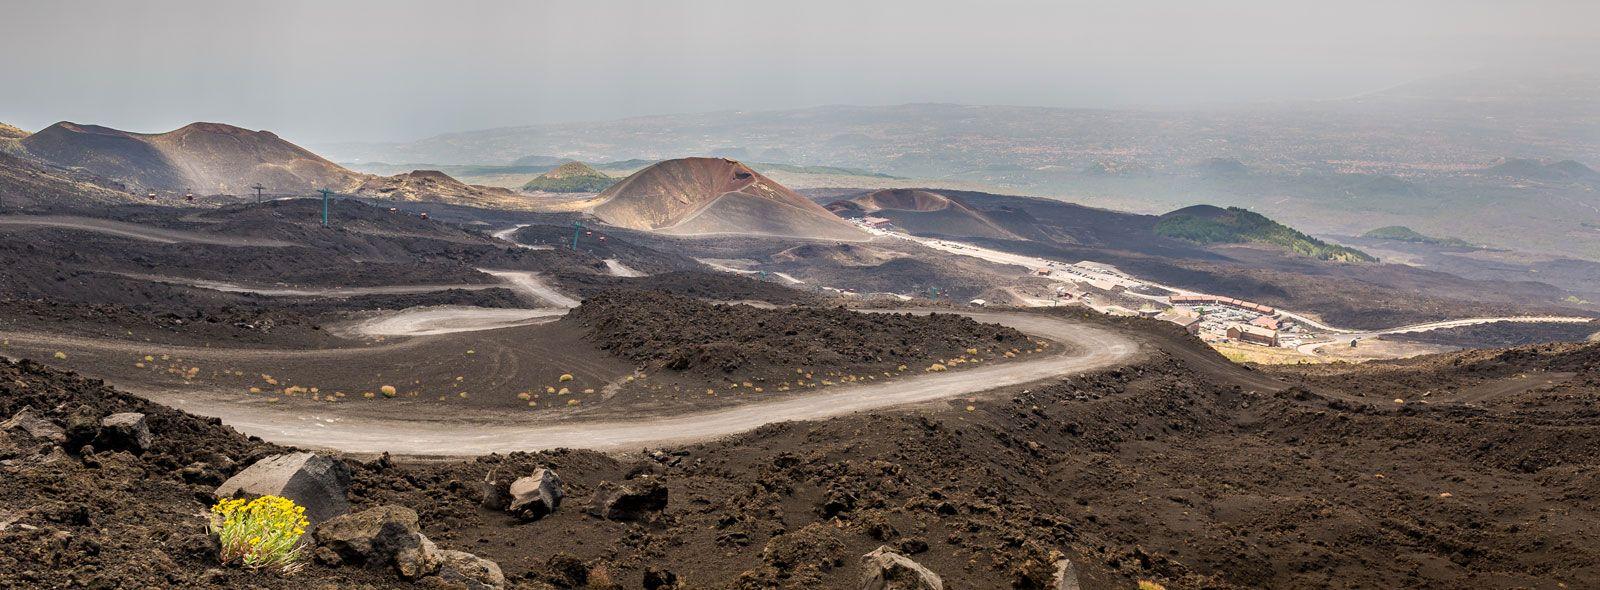 Etna escursioni